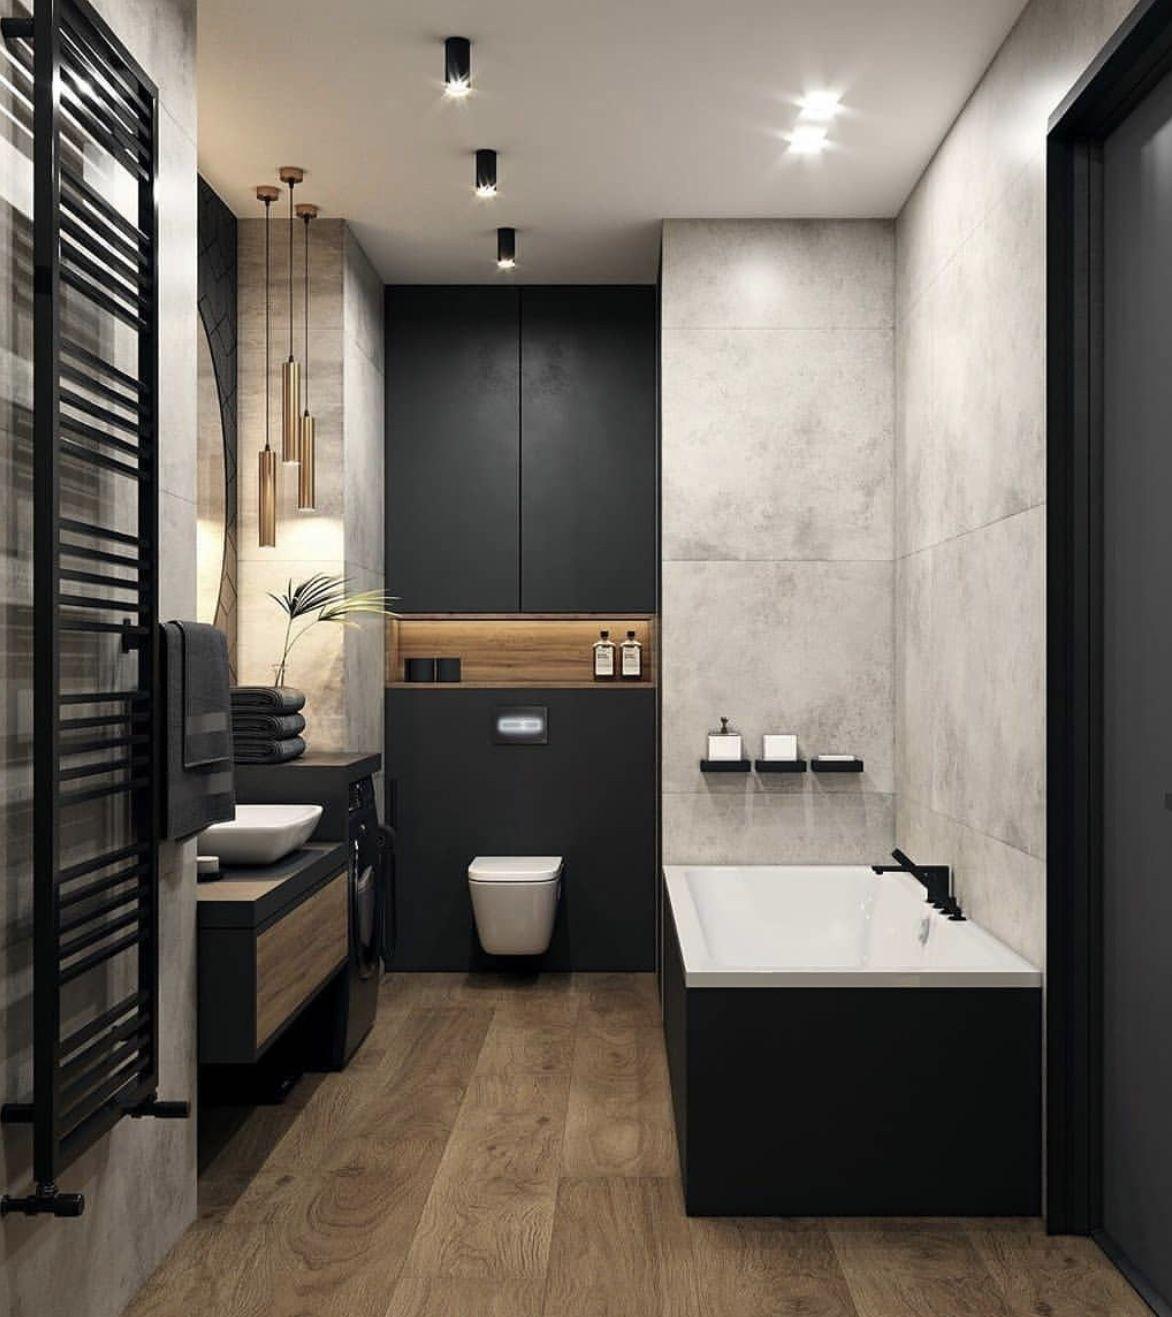 Pin By Alexa On Kepa Lazienka In 2020 Bathroom Design Luxury Bathroom Interior Design Modern Bathroom Design